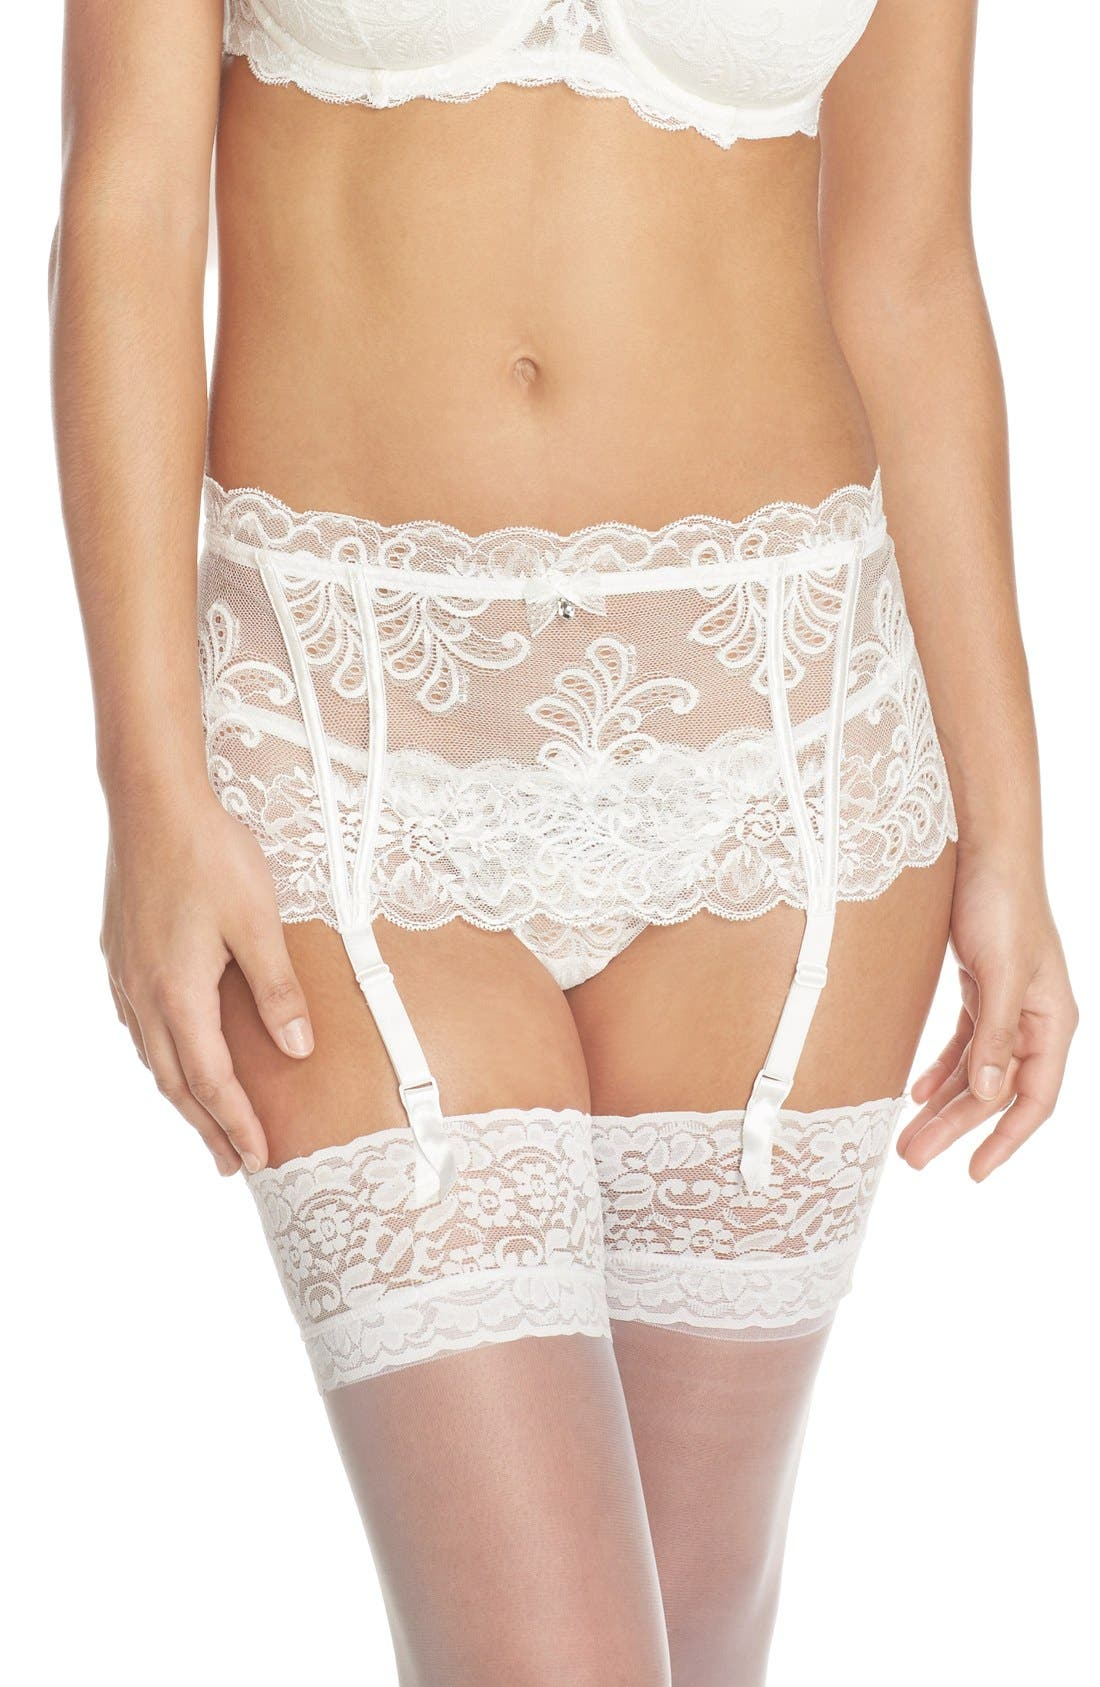 Alternate Image 1 Selected - Le Mysère 'Sophia' Lace Garter Belt